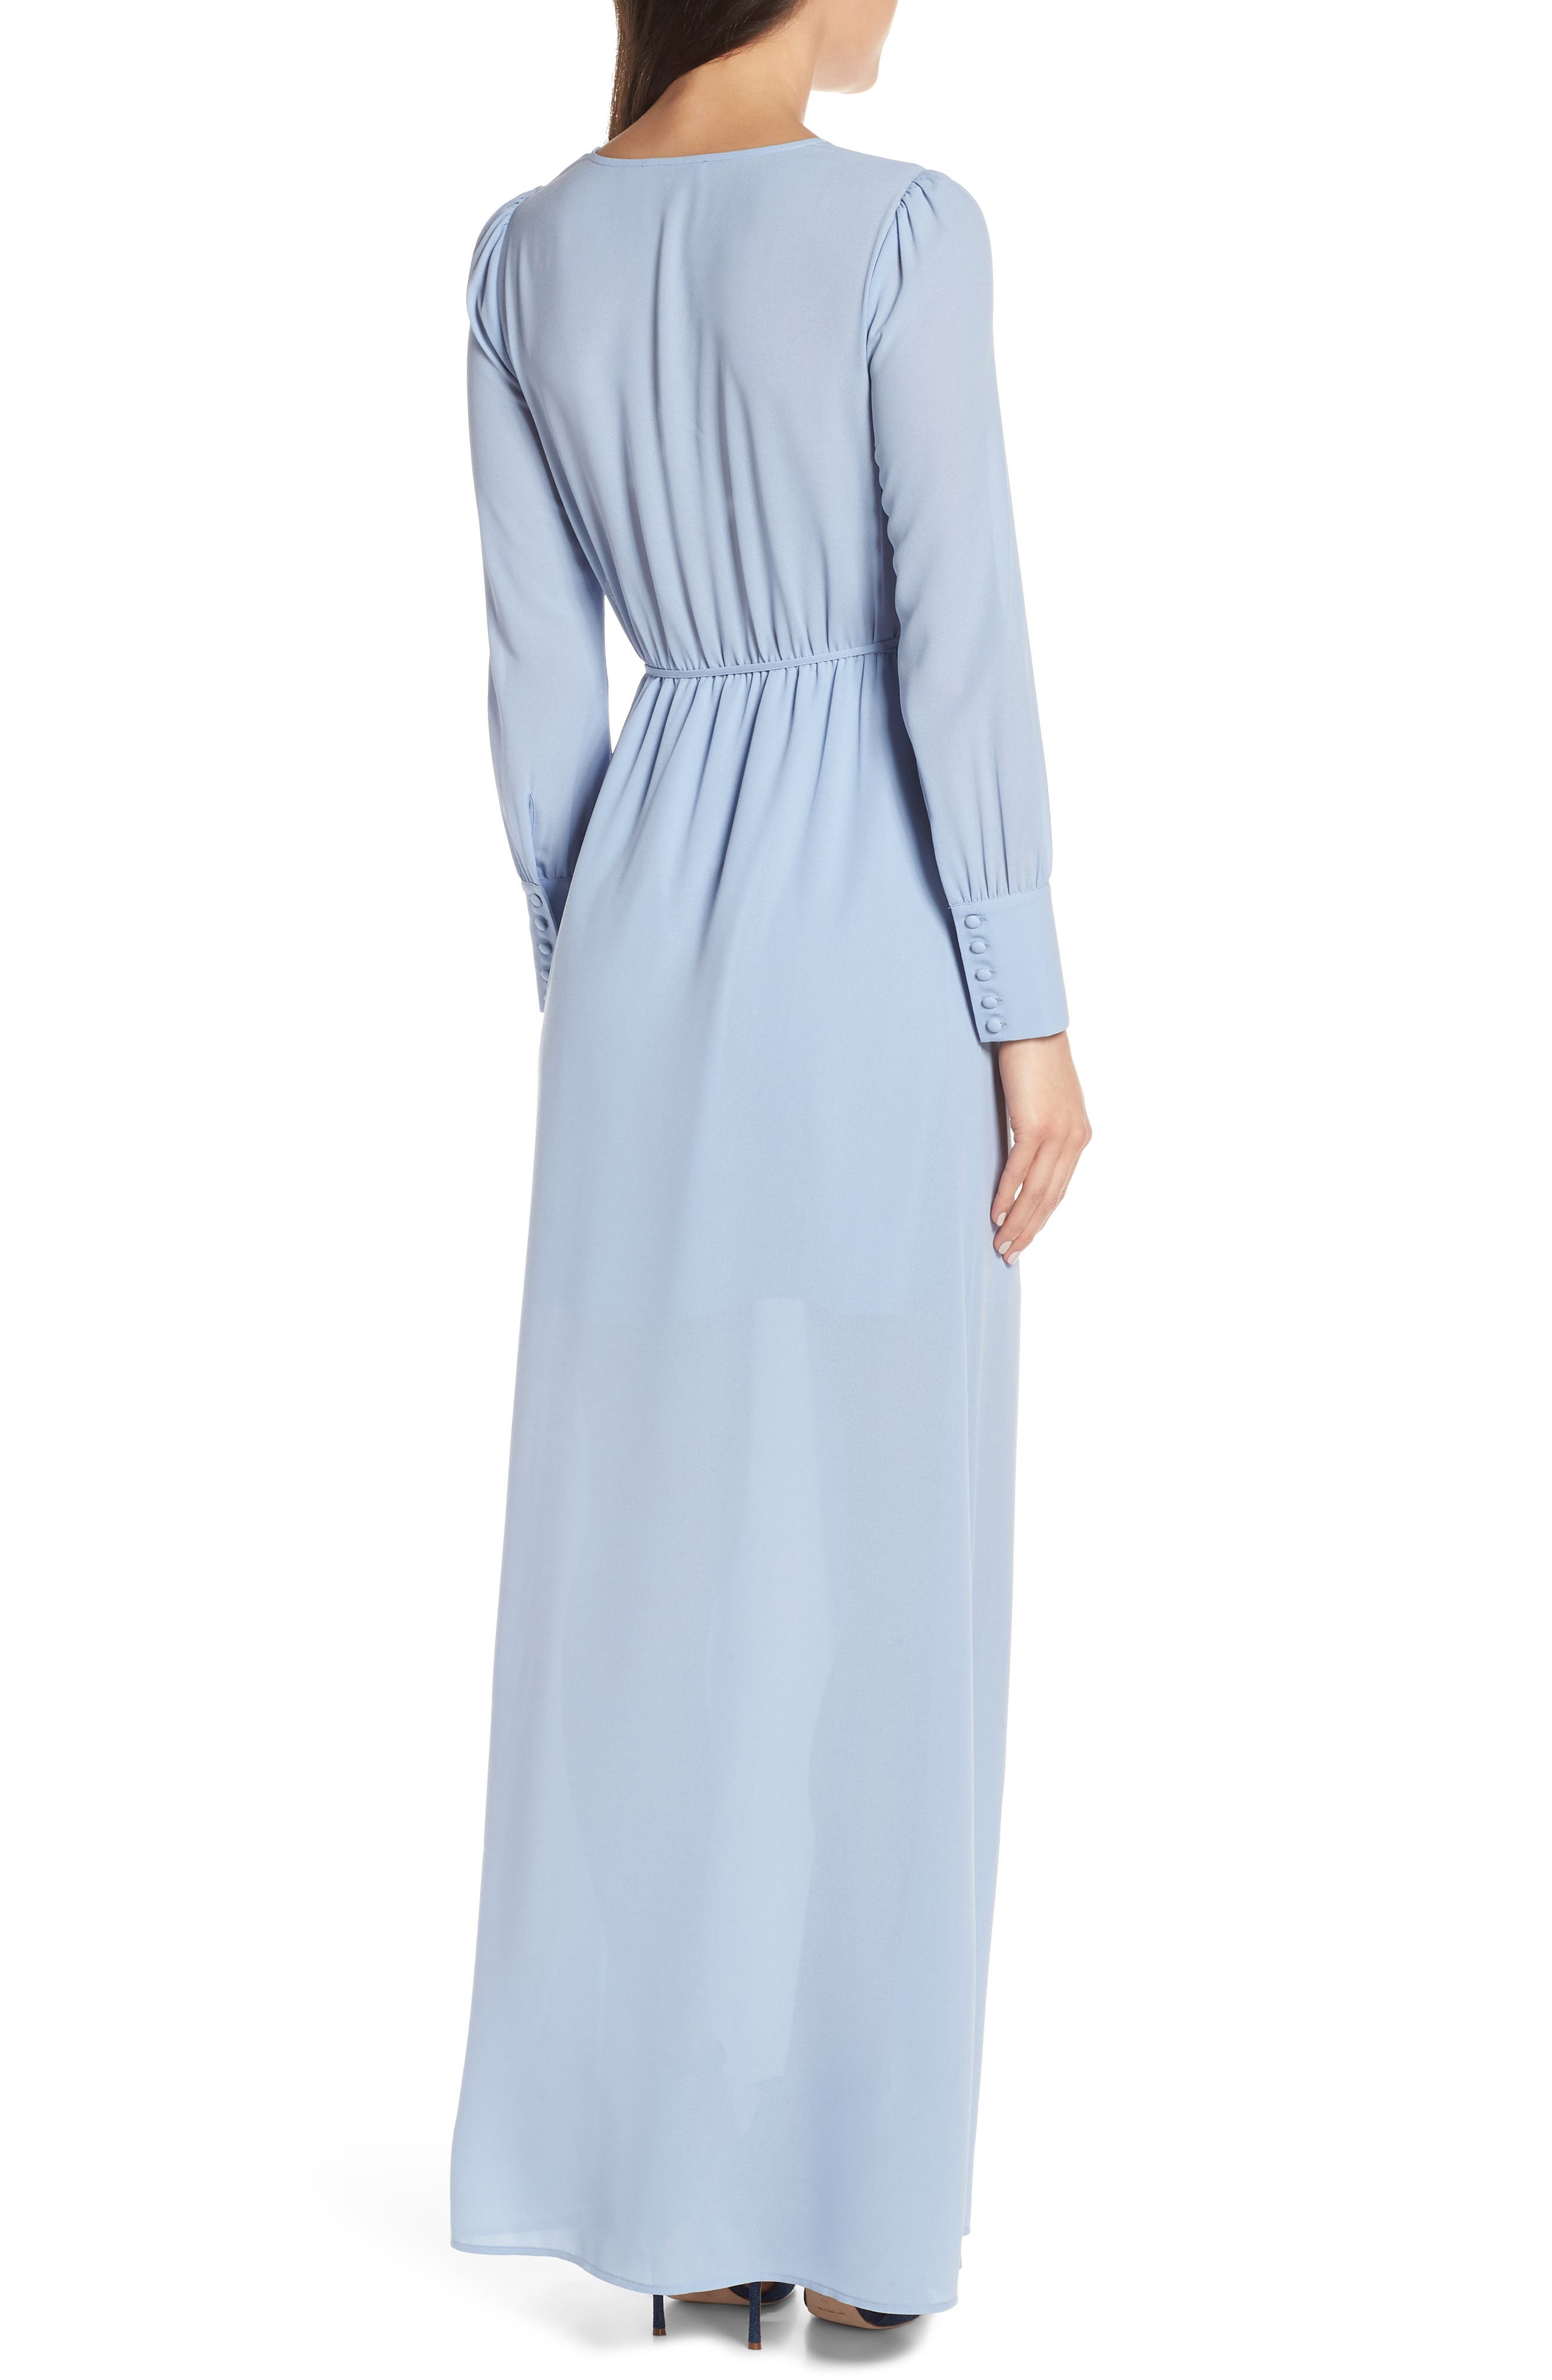 ALI & JAY, Garden Stroll Wrap Maxi Dress, Alternate thumbnail 2, color, 400